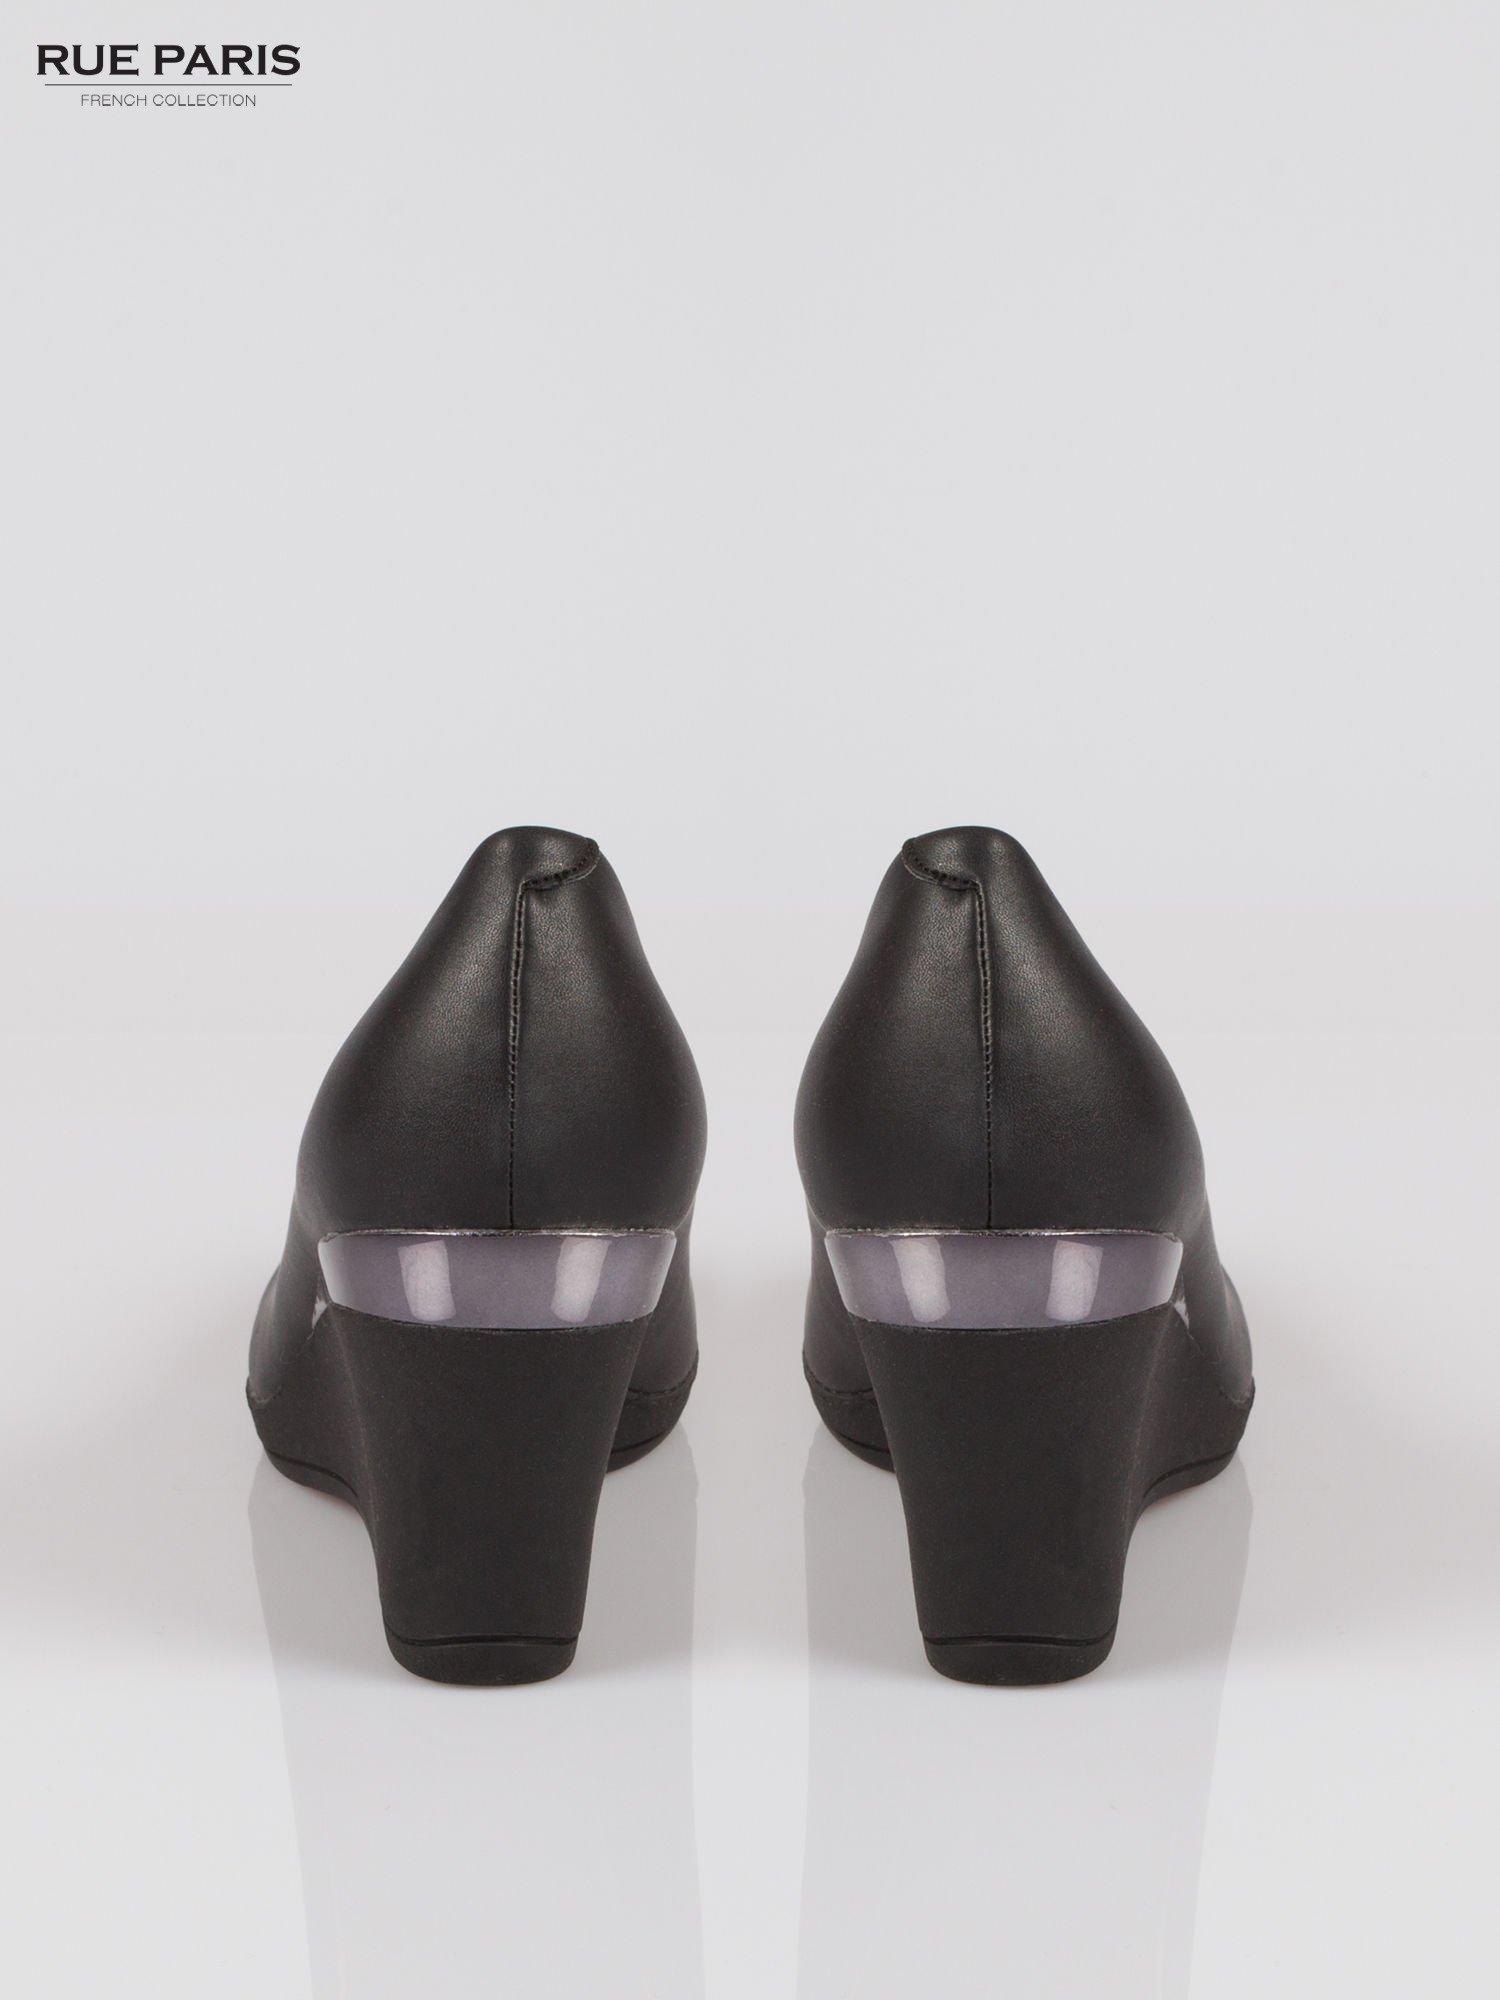 Czarne koturny faux leather Marika ze srebrnym detalem                                  zdj.                                  3